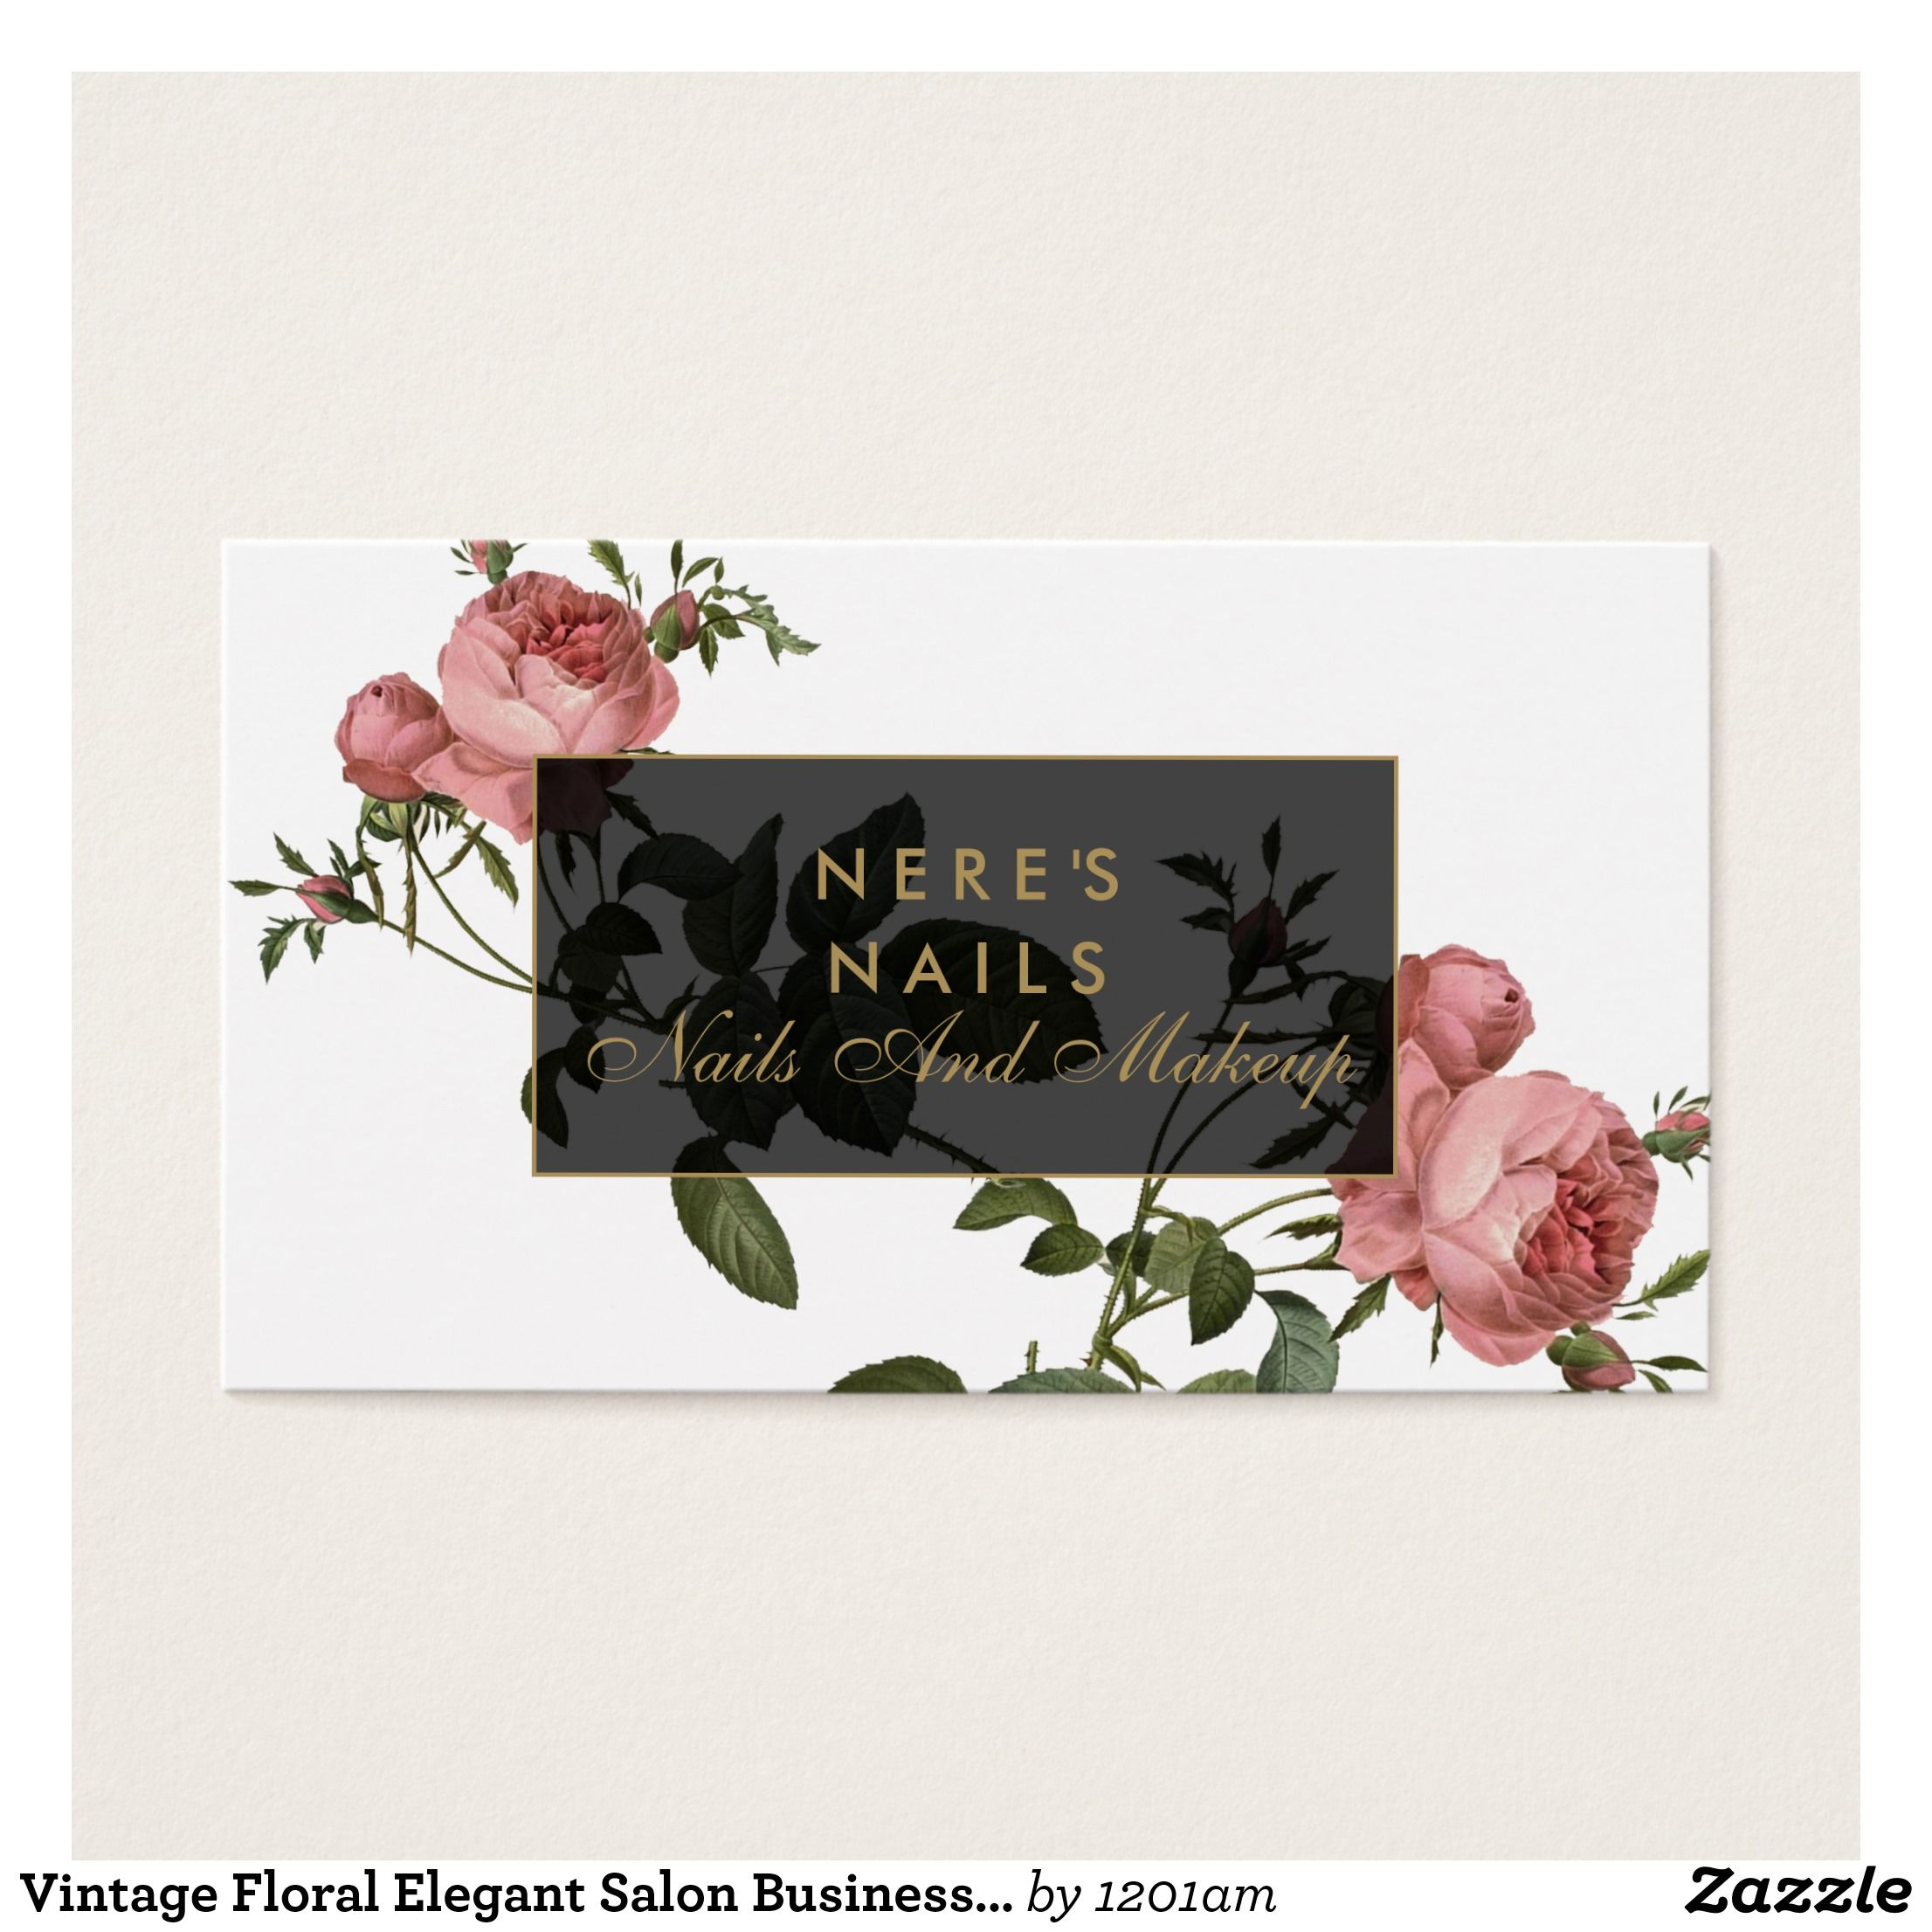 Vintage Floral Elegant Salon Business Card | Business cards and Business